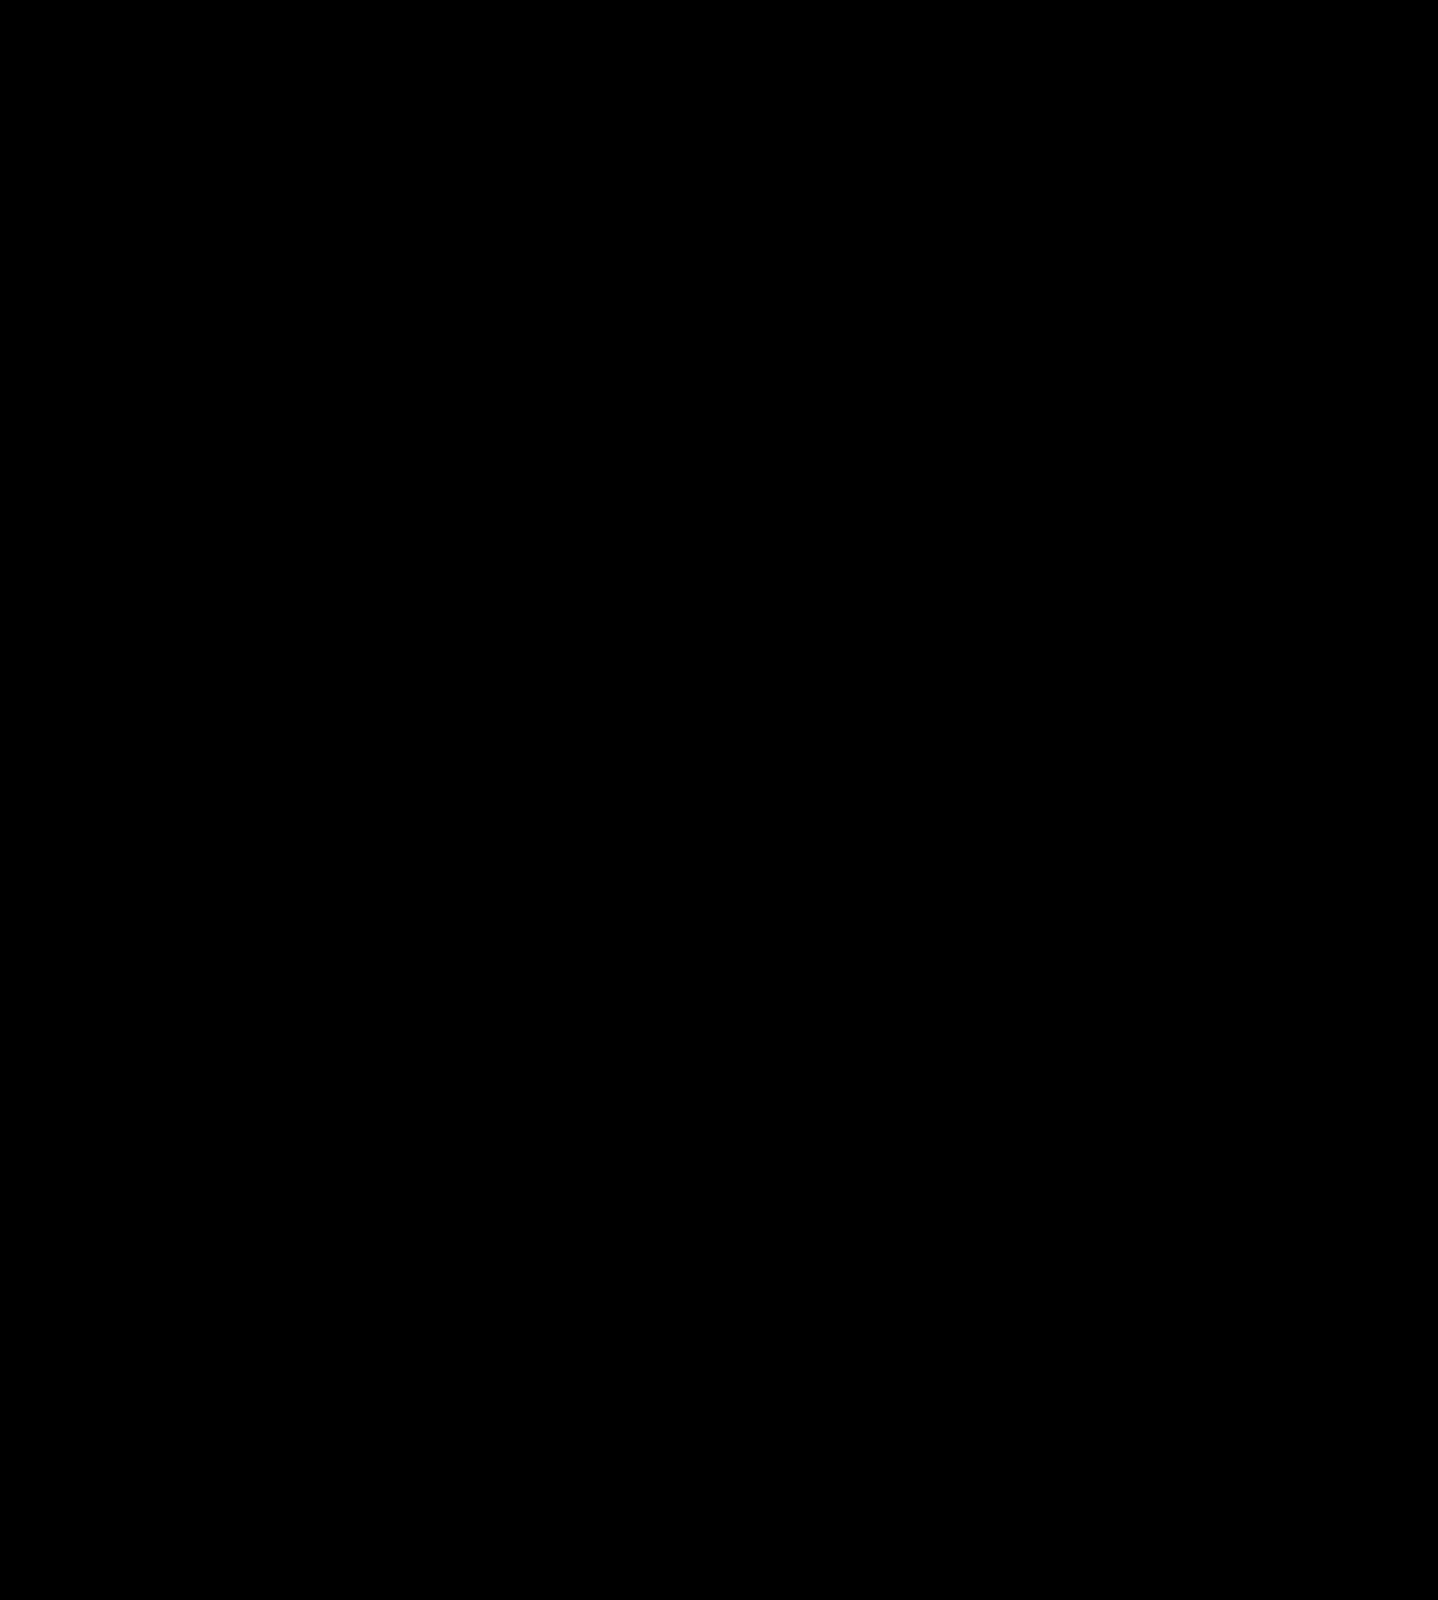 三代目JSB登坂広臣 高画質ロゴ